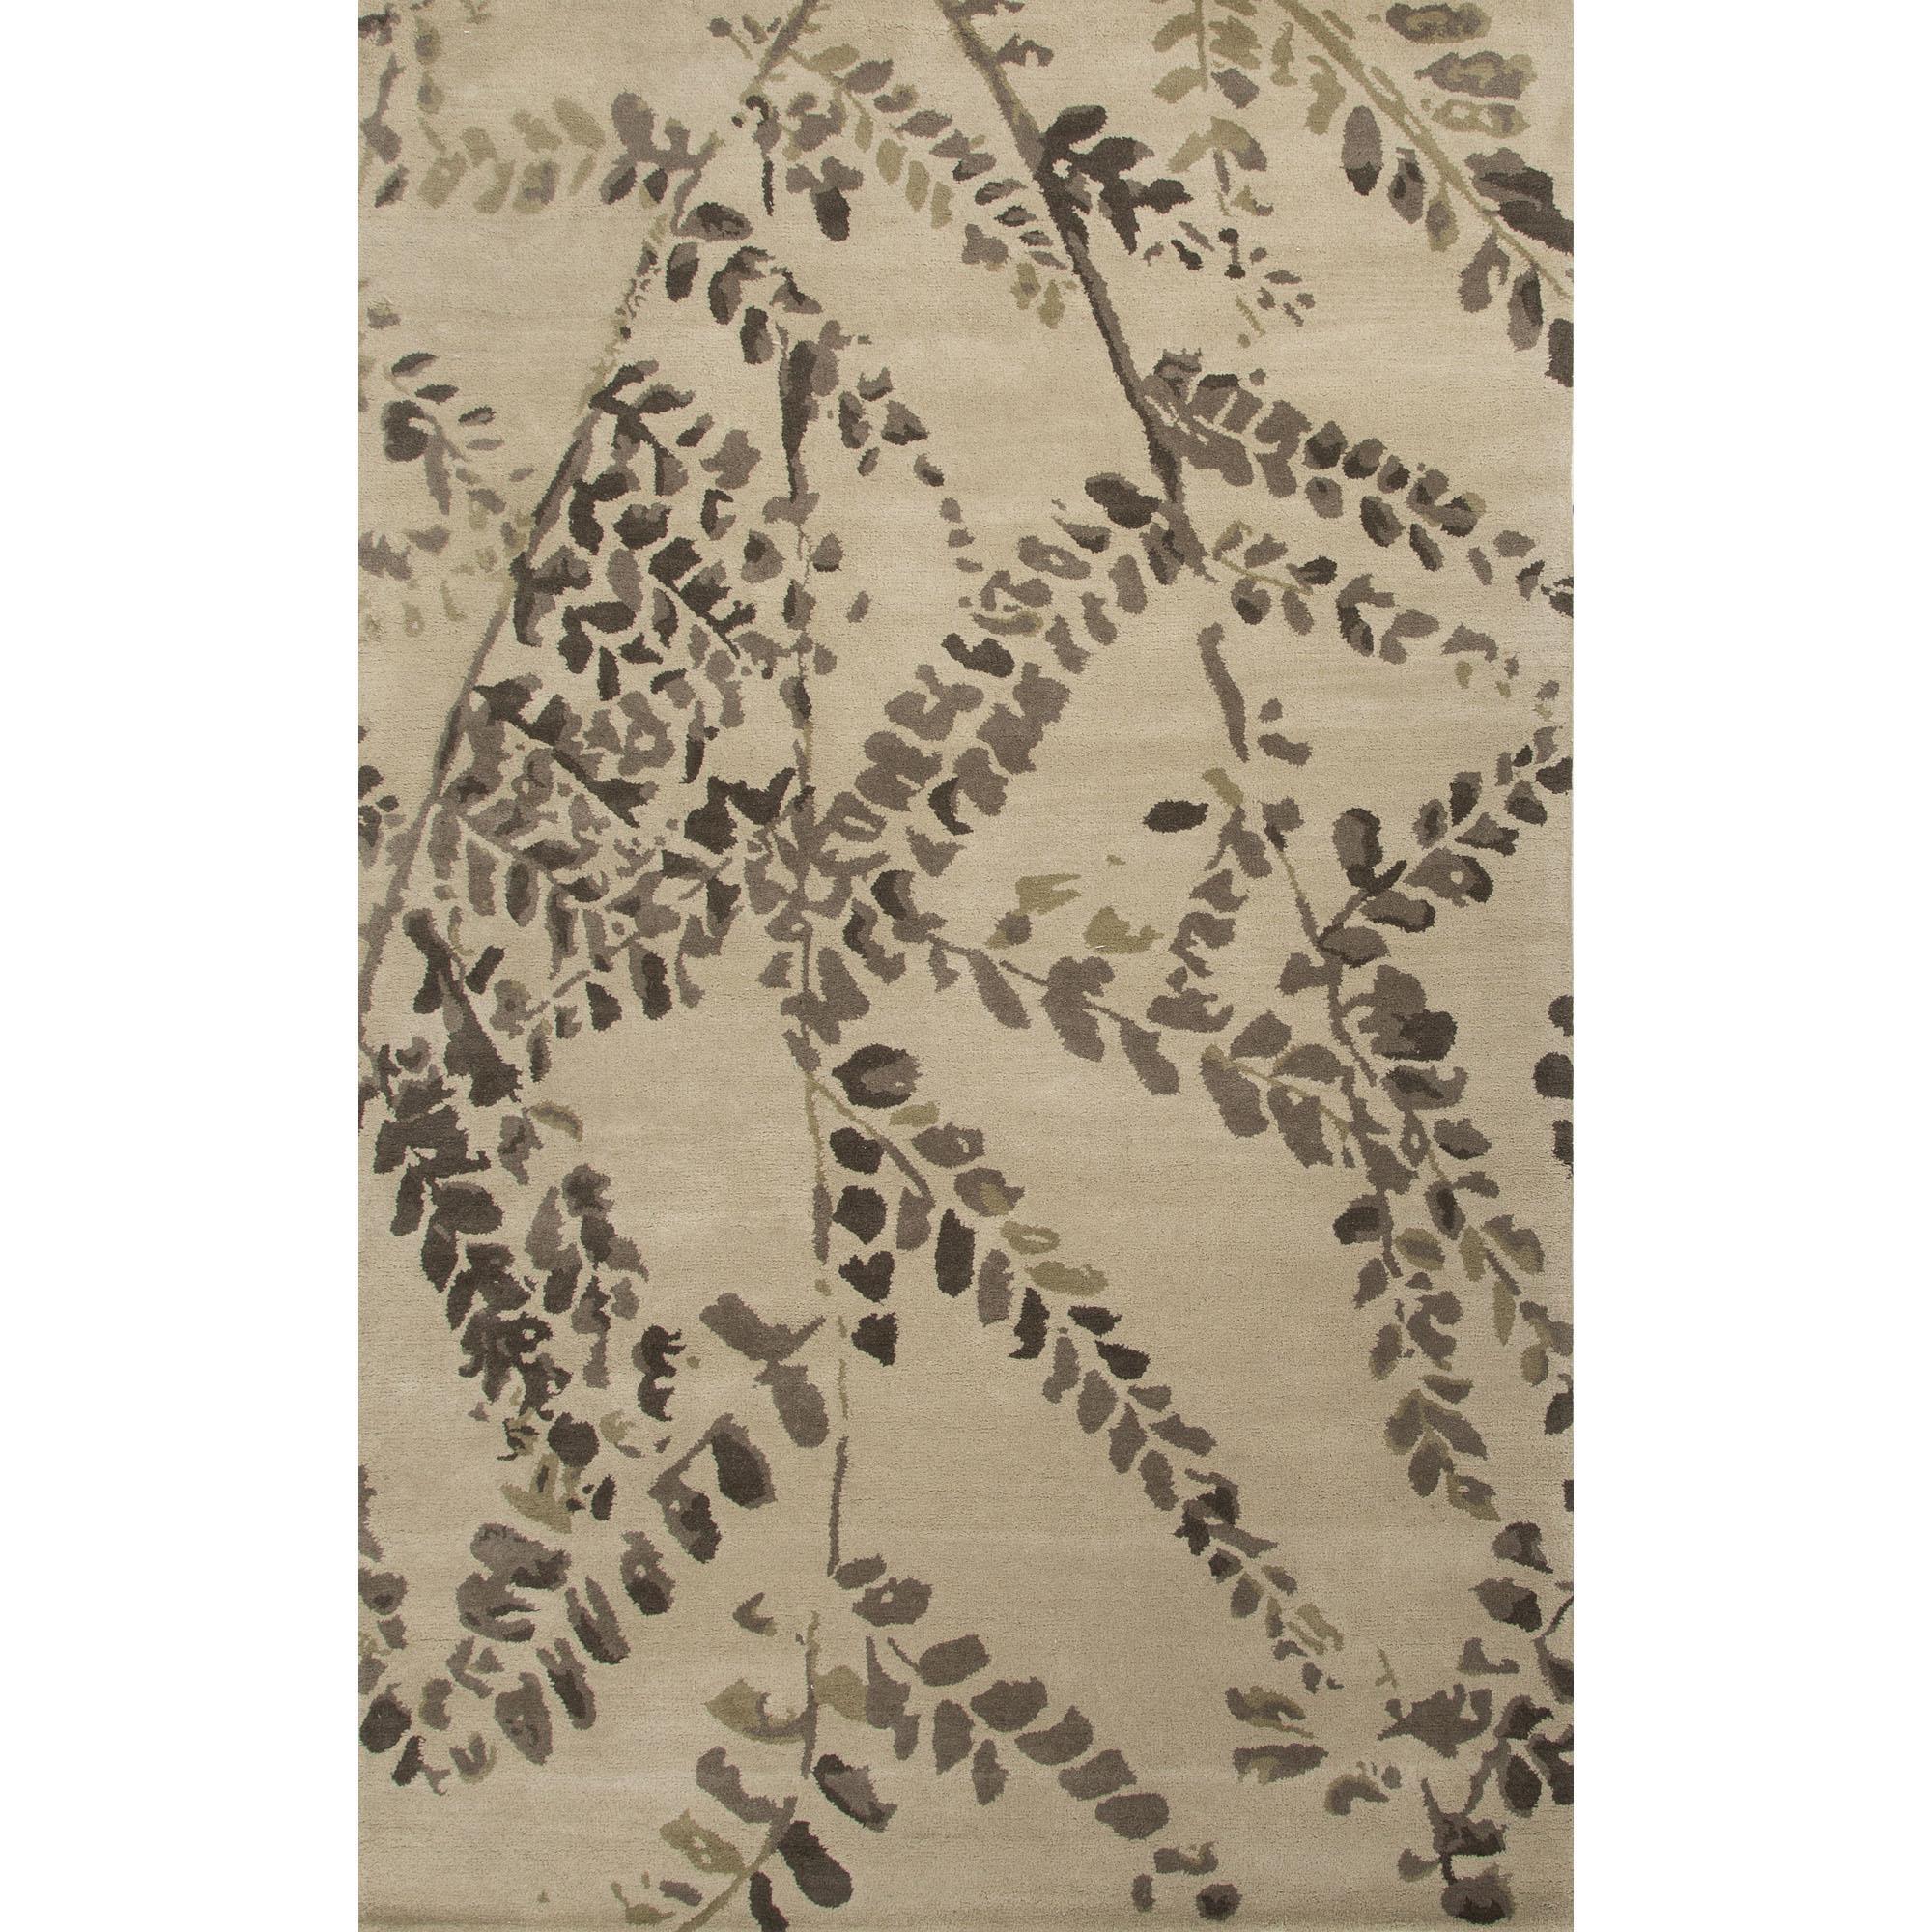 JAIPUR Rugs En Casa By Luli Sanchez Tufted 5 x 8 Rug - Item Number: RUG117425